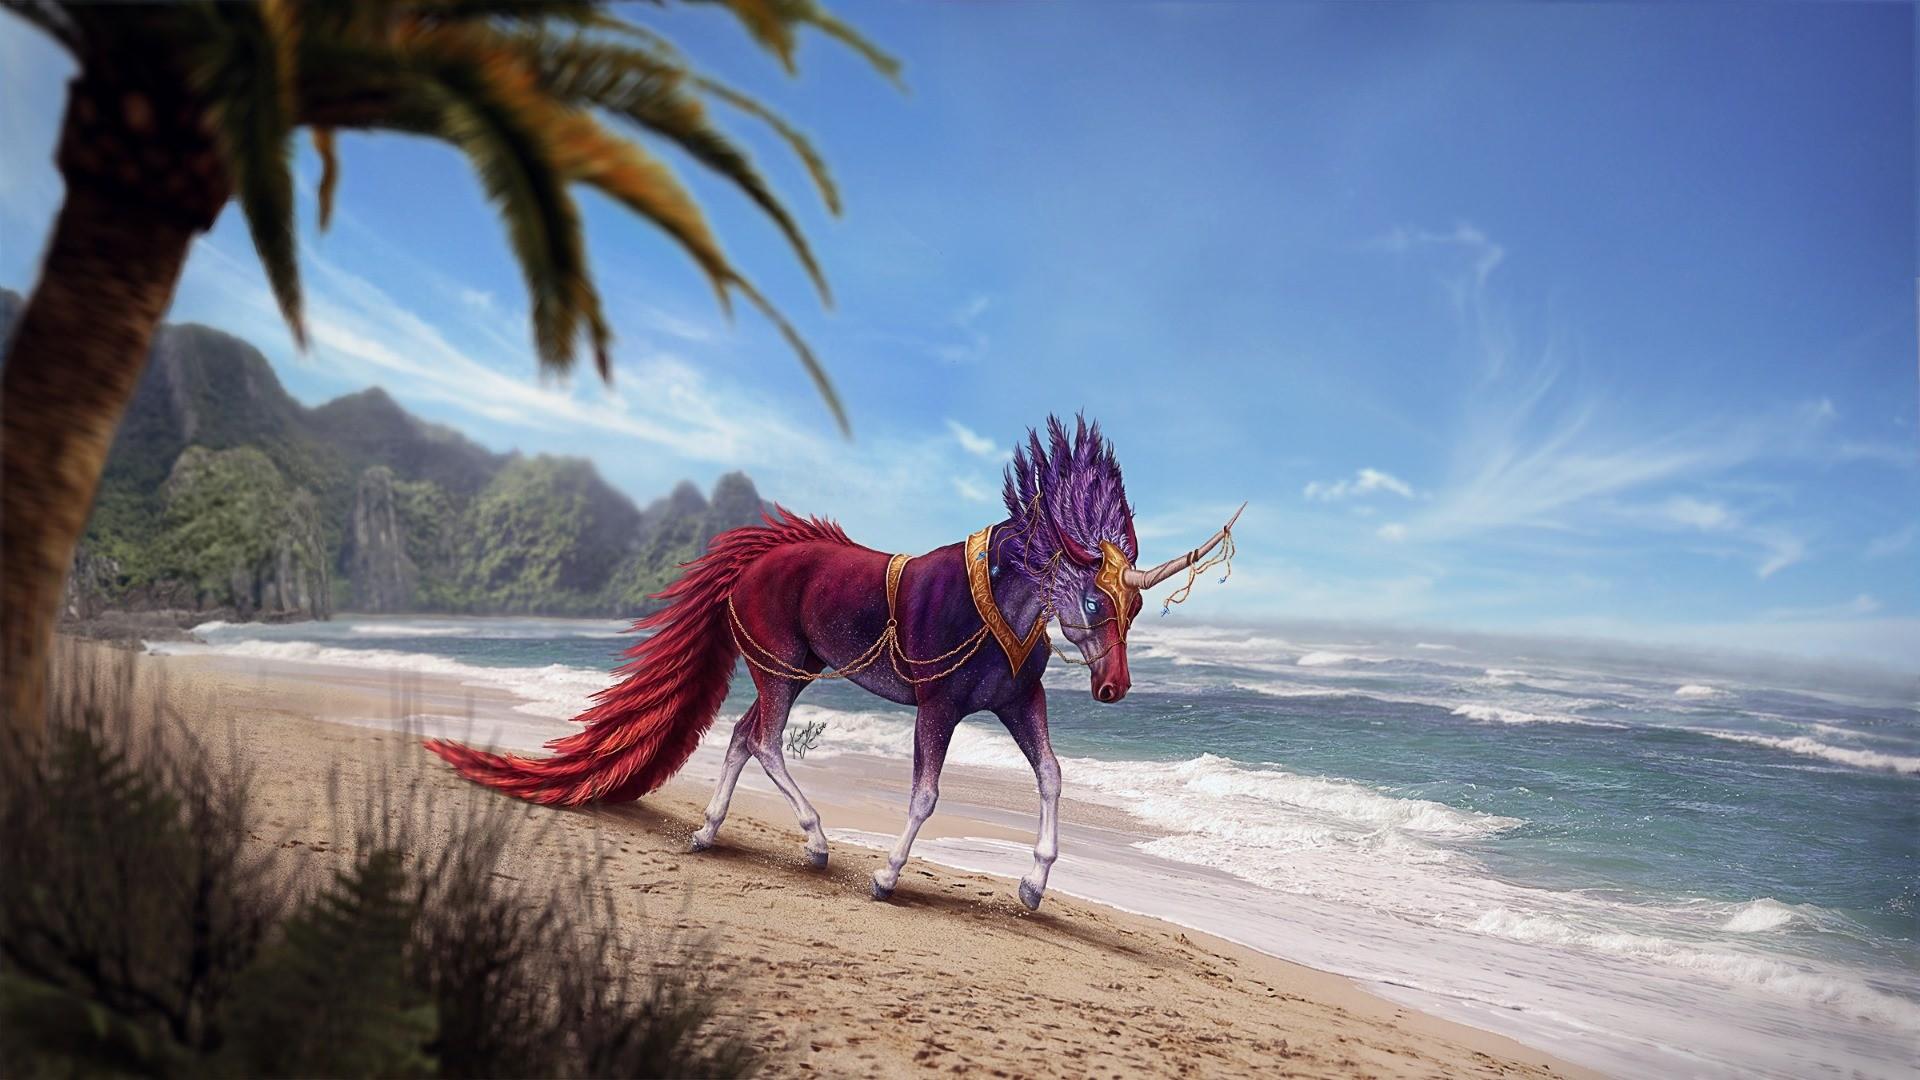 hinh nen ky lan unicorn 17